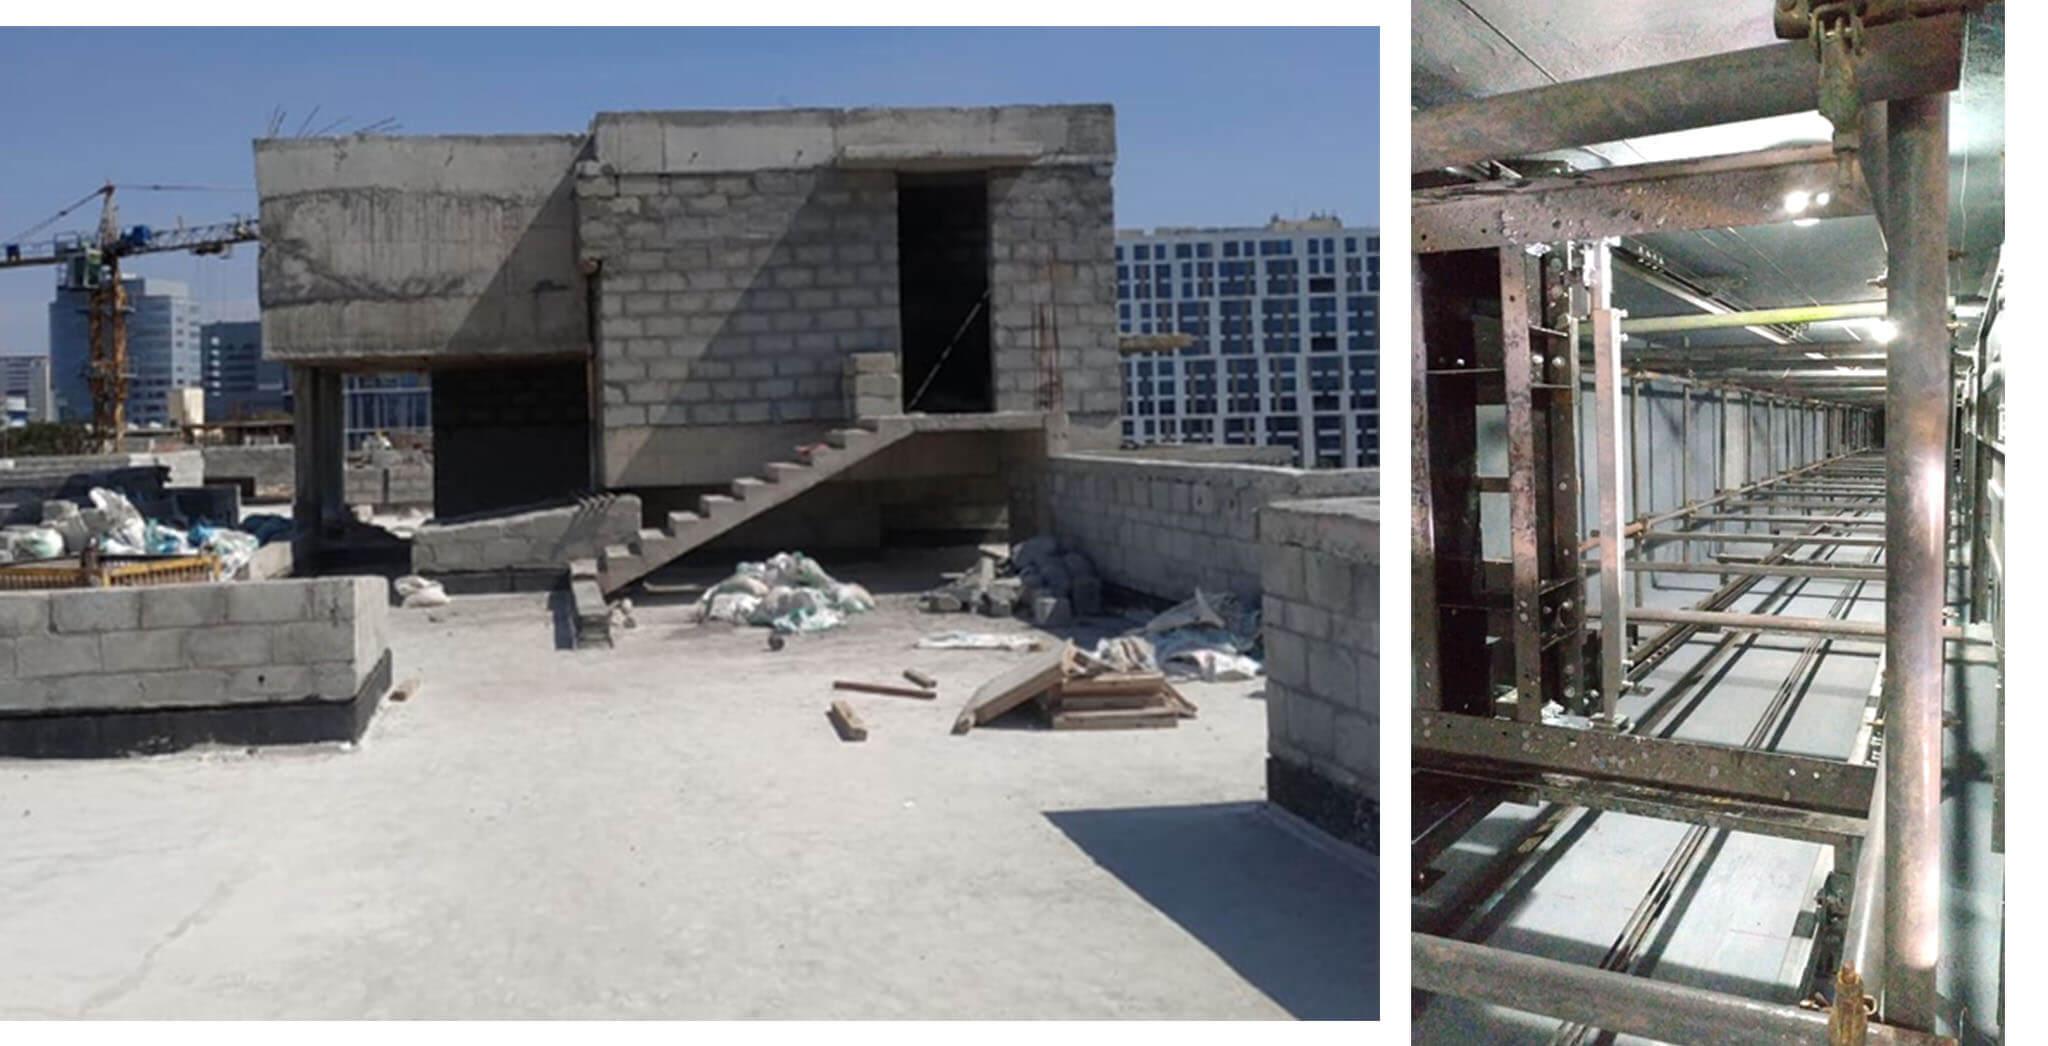 Dec 2020 - L Block: LMR top slab and OHT, Terrace floor waterproofing-screed work completed; Lift installation work-in-progress.